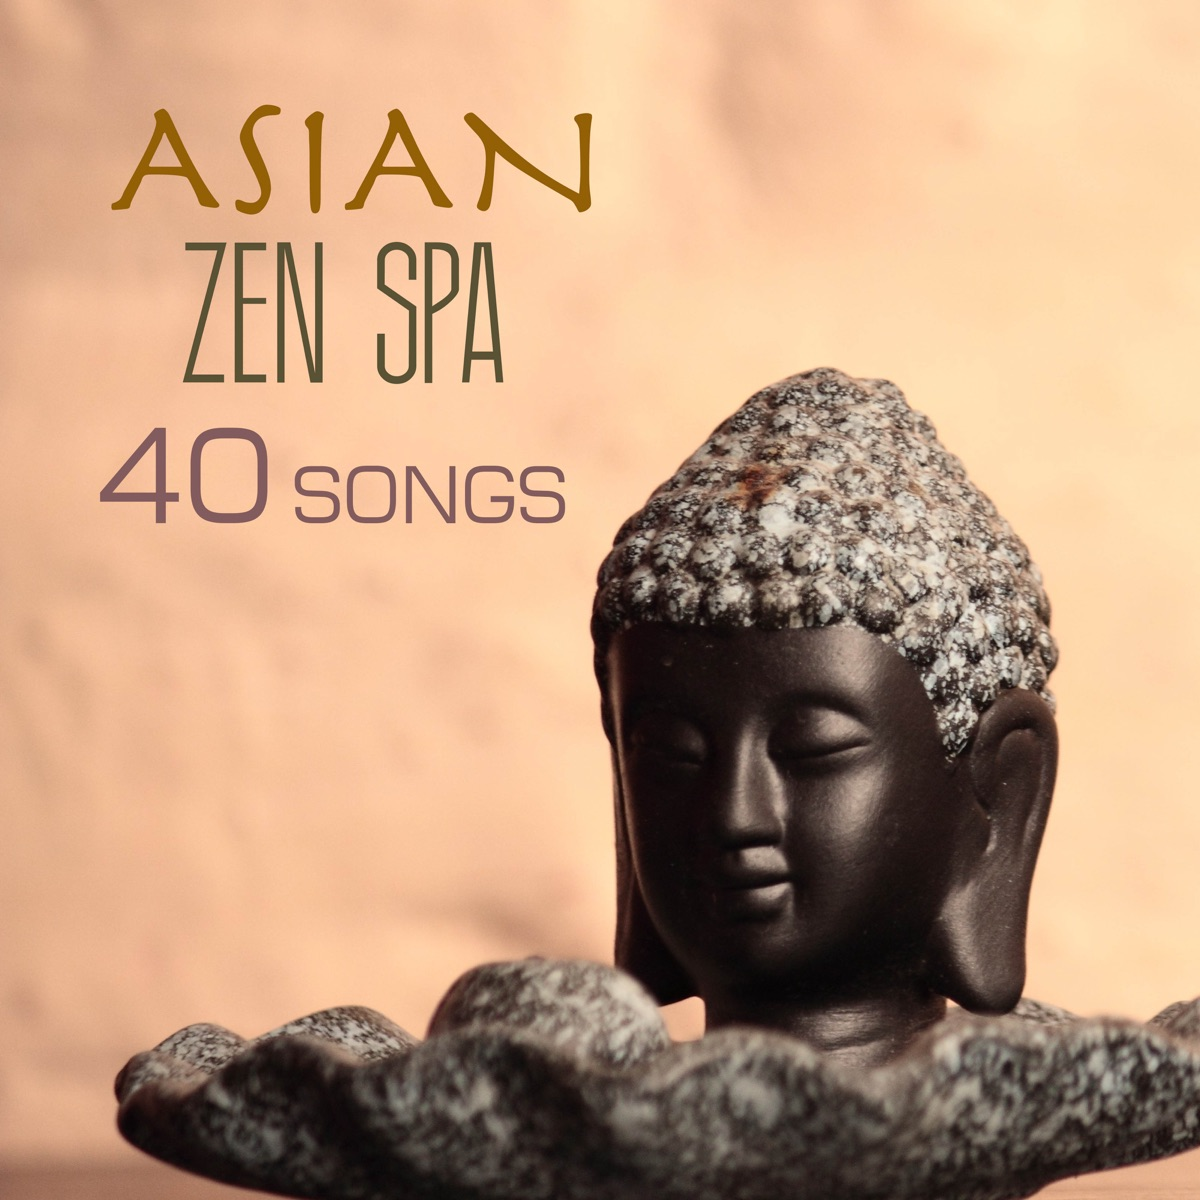 Asian Zen Spa Music - 40 Tracks for Meditation, Massage, Yoga, Sound